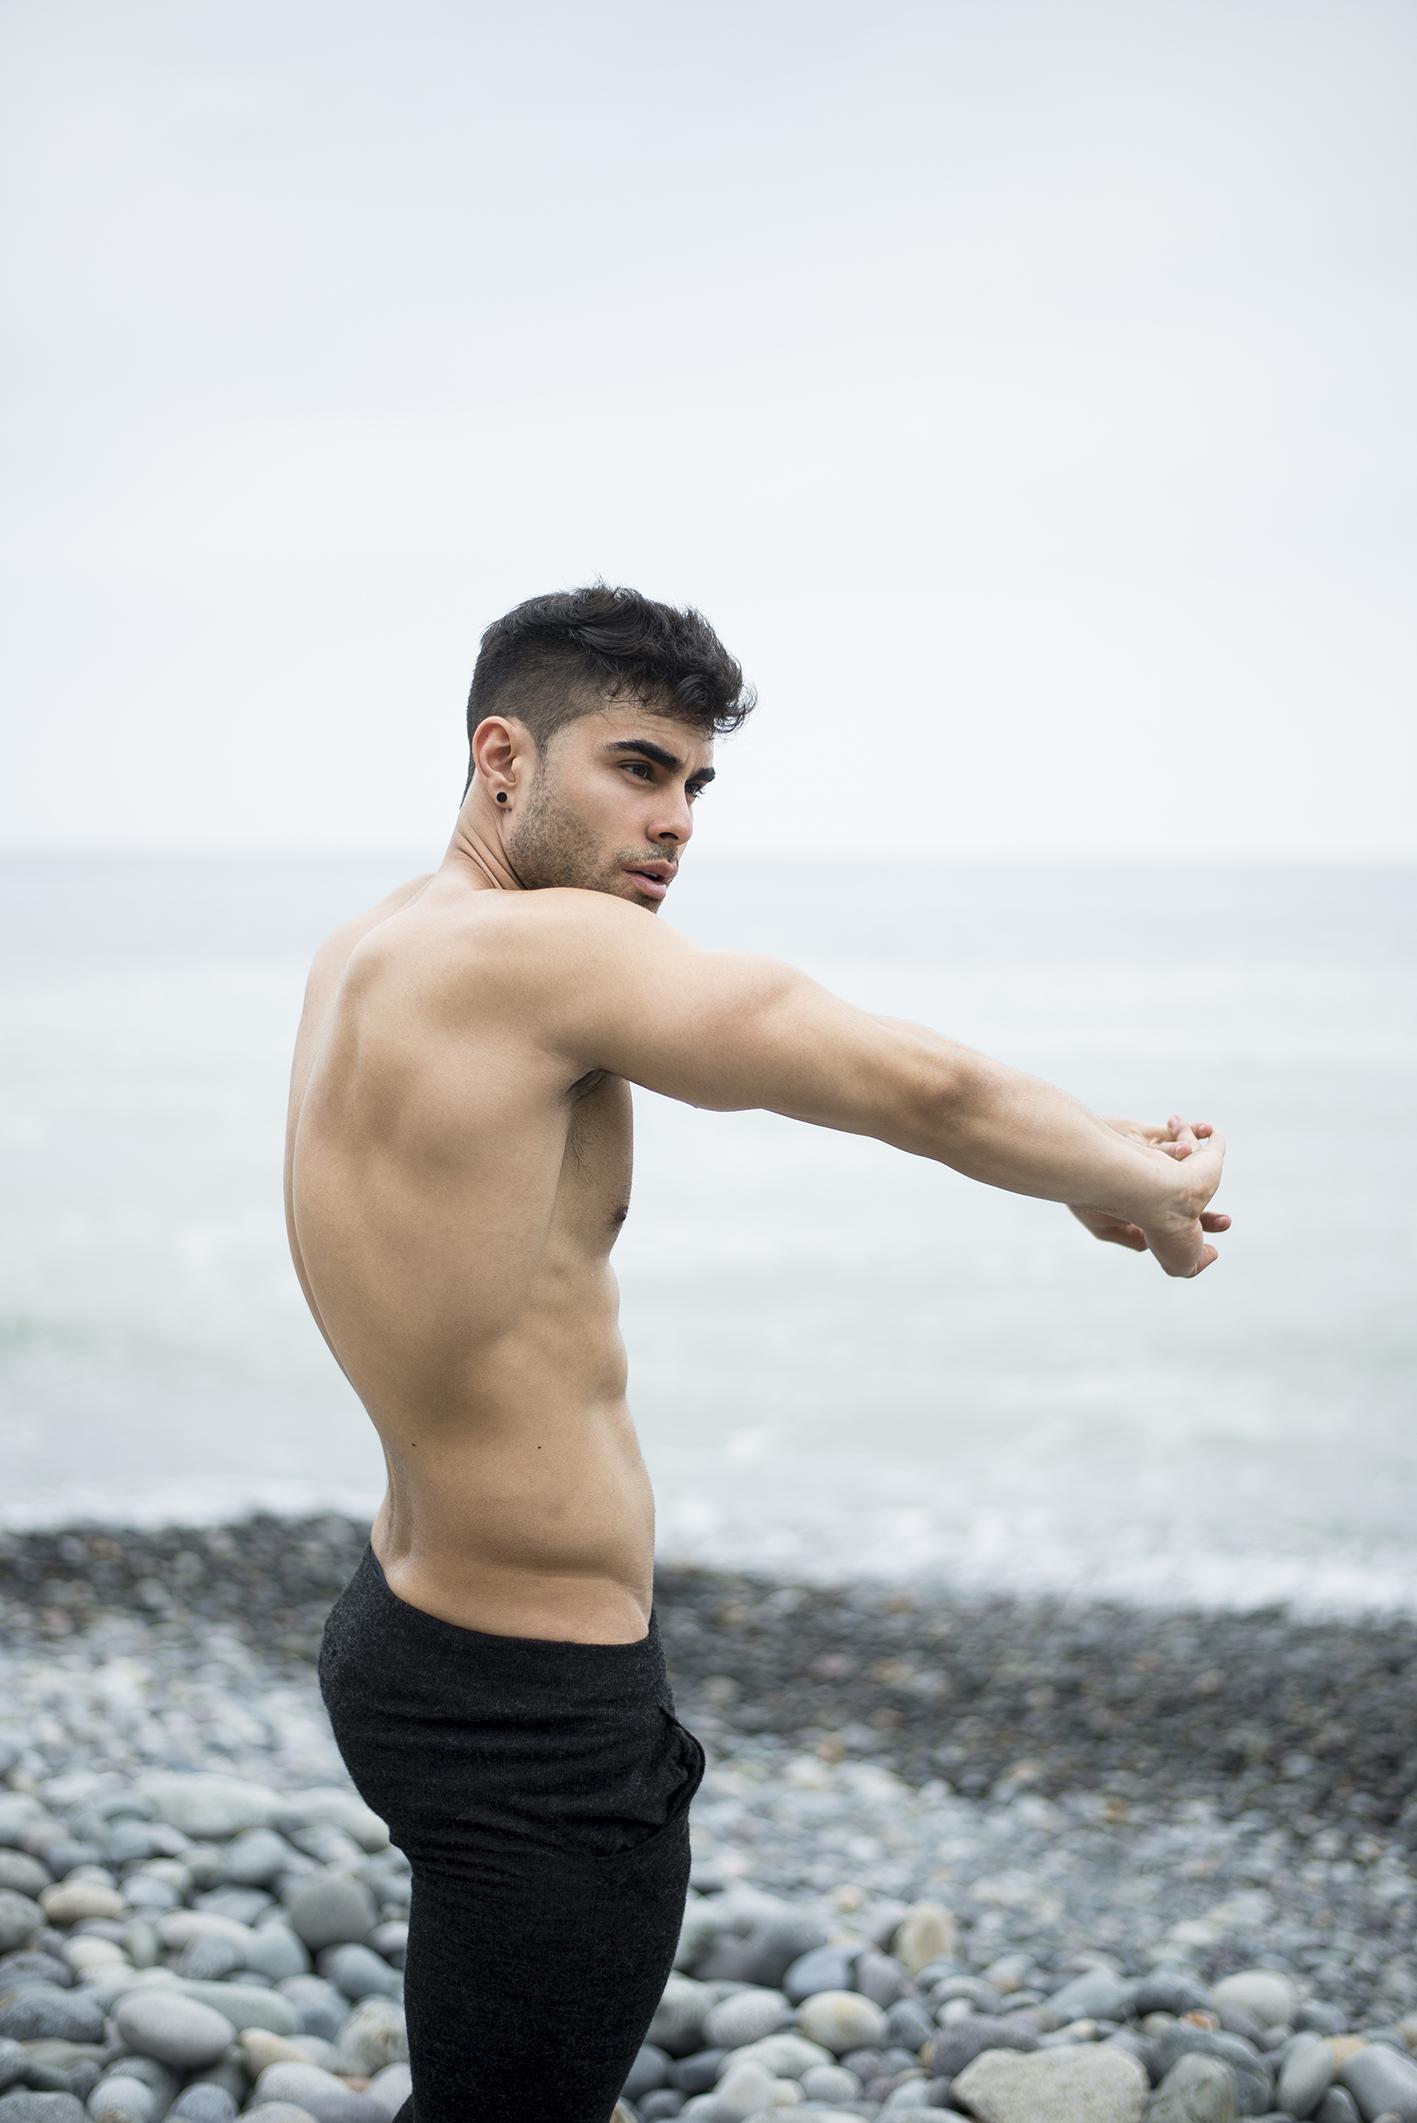 Alexi Descalzo Pam pa las mujeres Modelo Model male man sexy hot Summer Body Winter -004.jpg